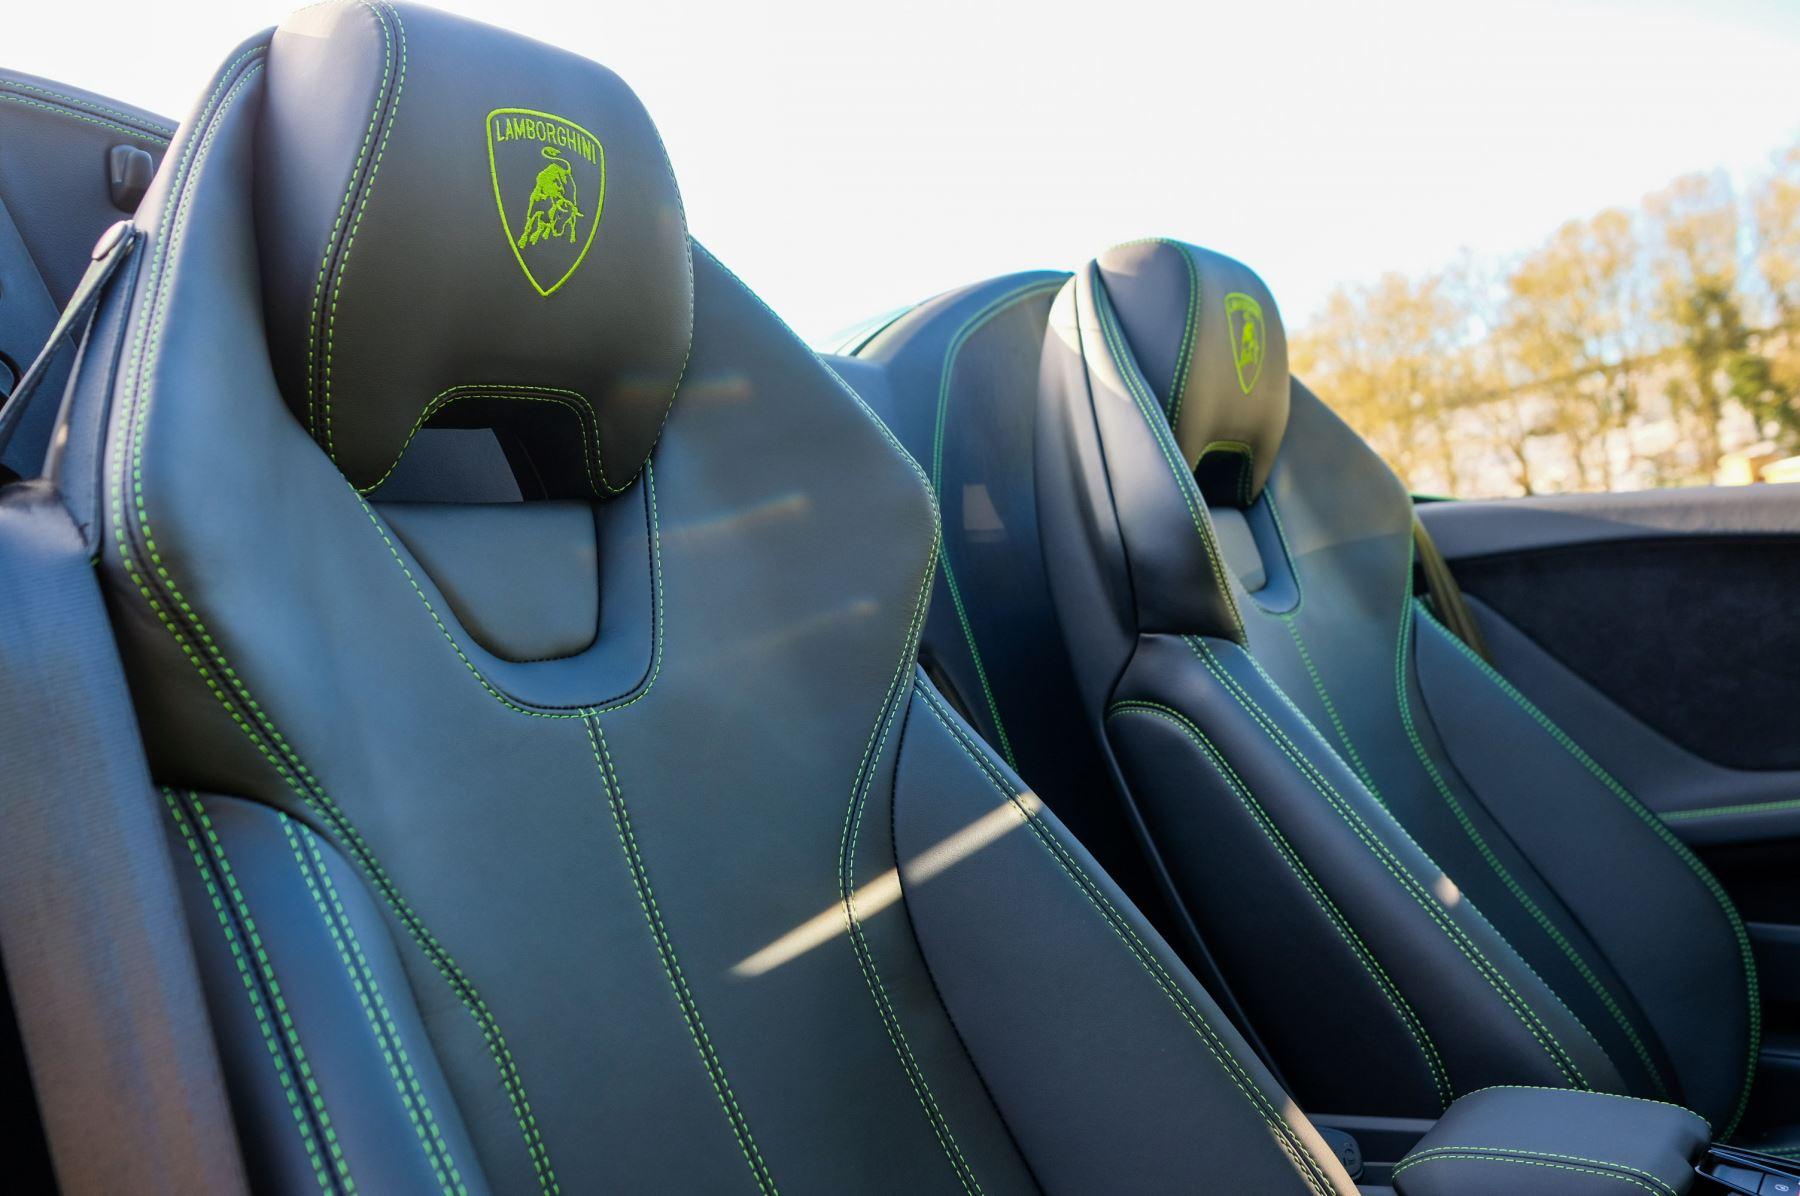 Lamborghini Huracan EVO Spyder 5.2 V10 610 2dr Auto image 13